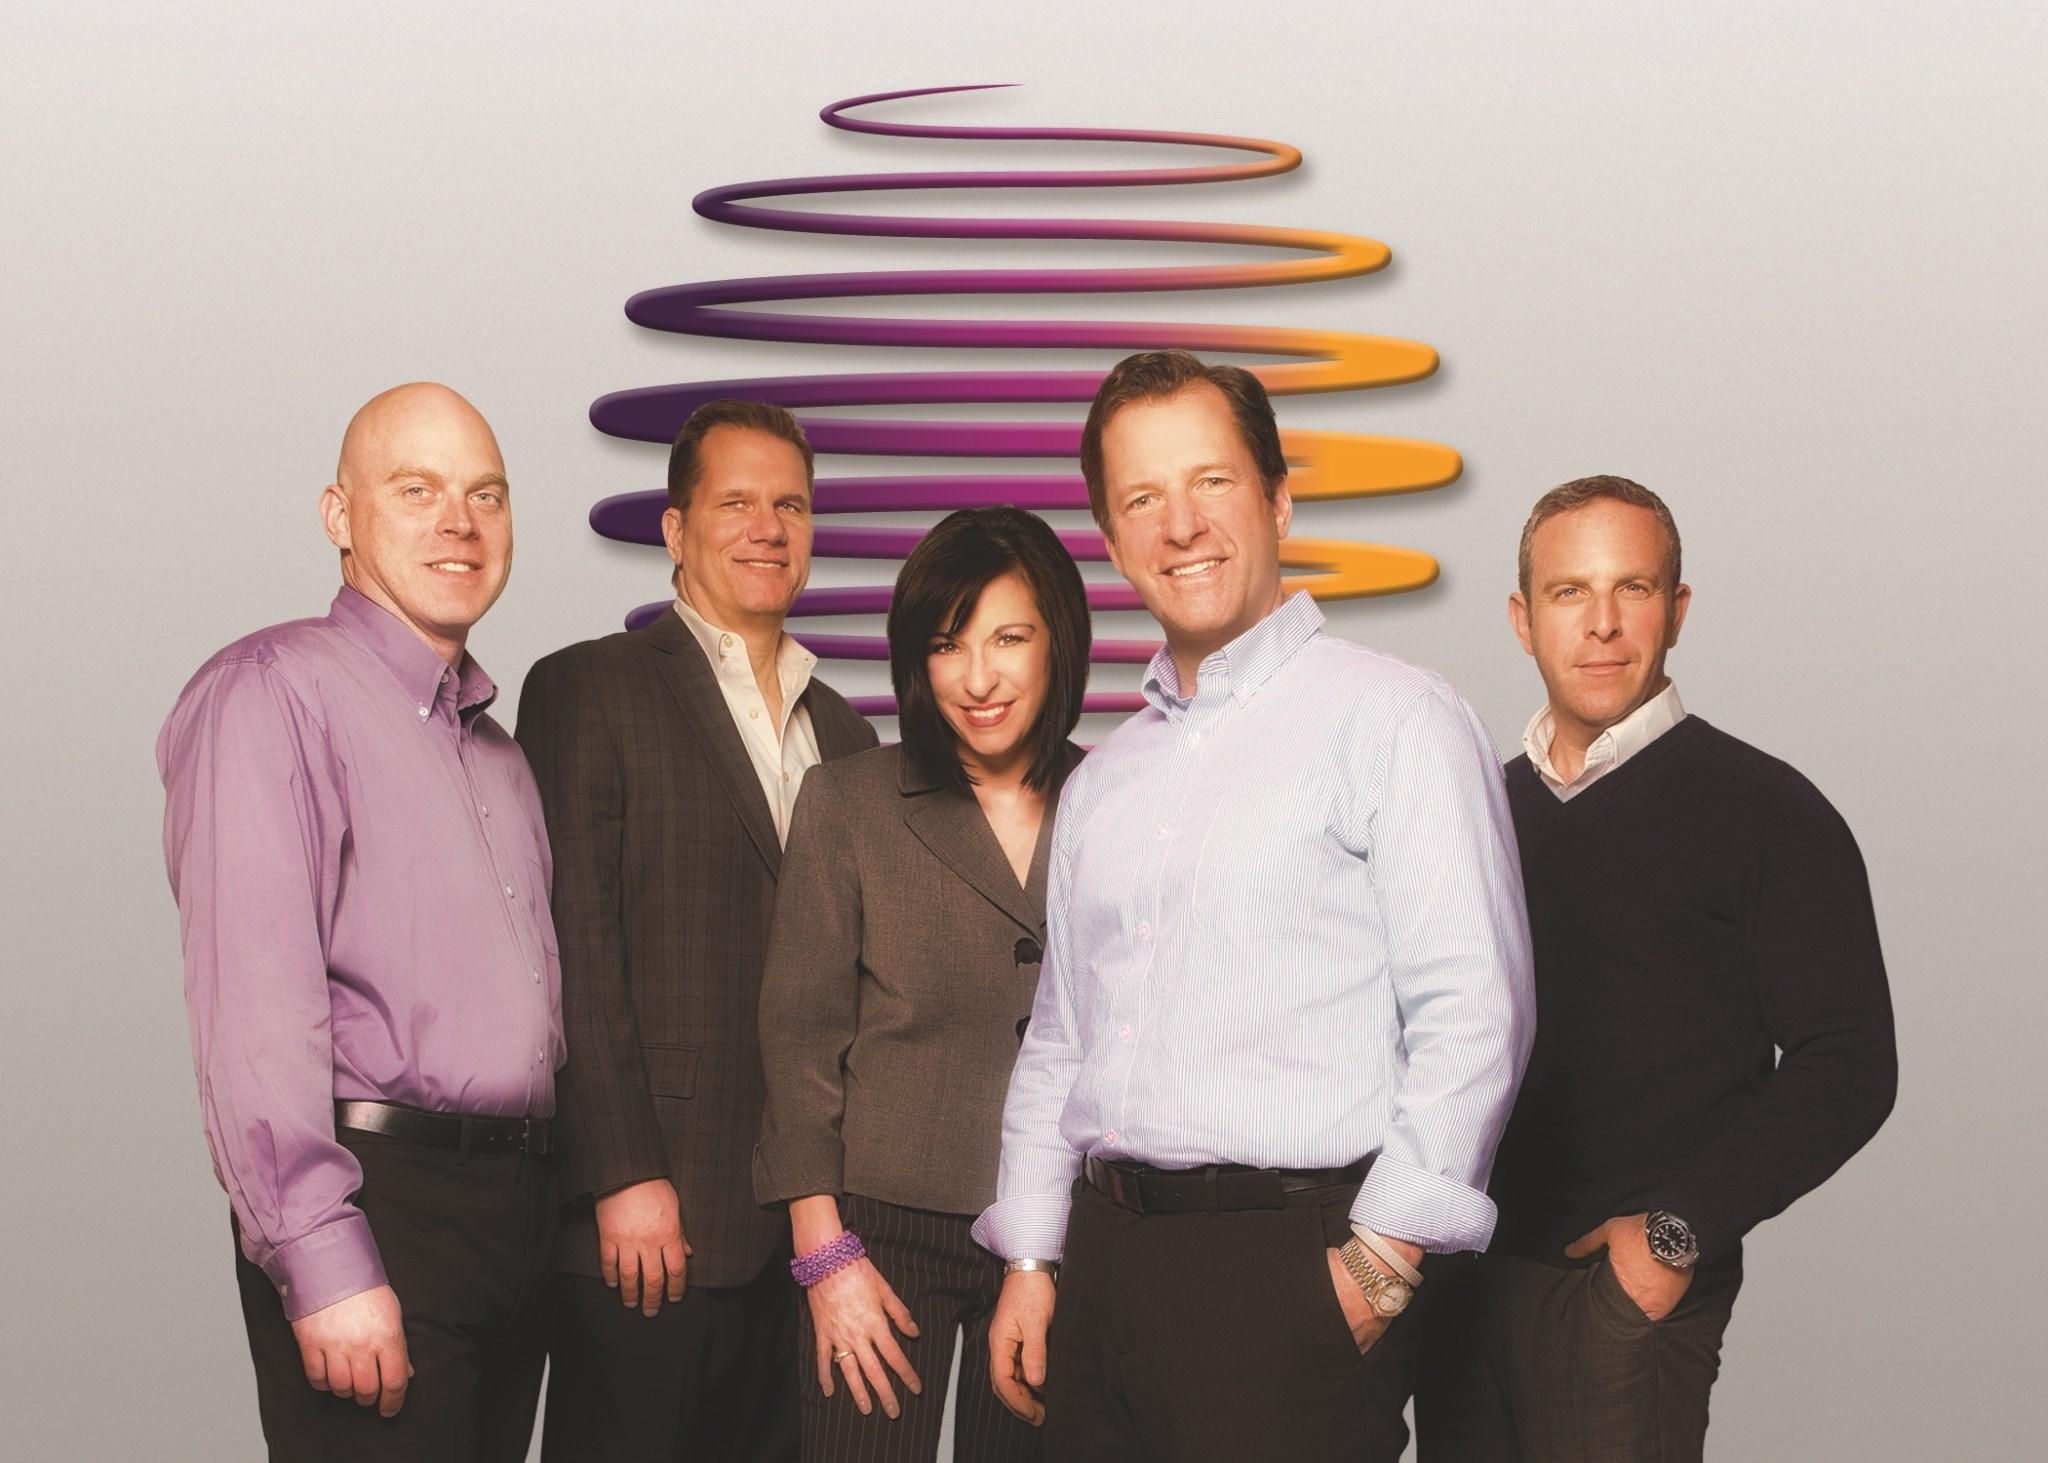 The PulseCX executive team